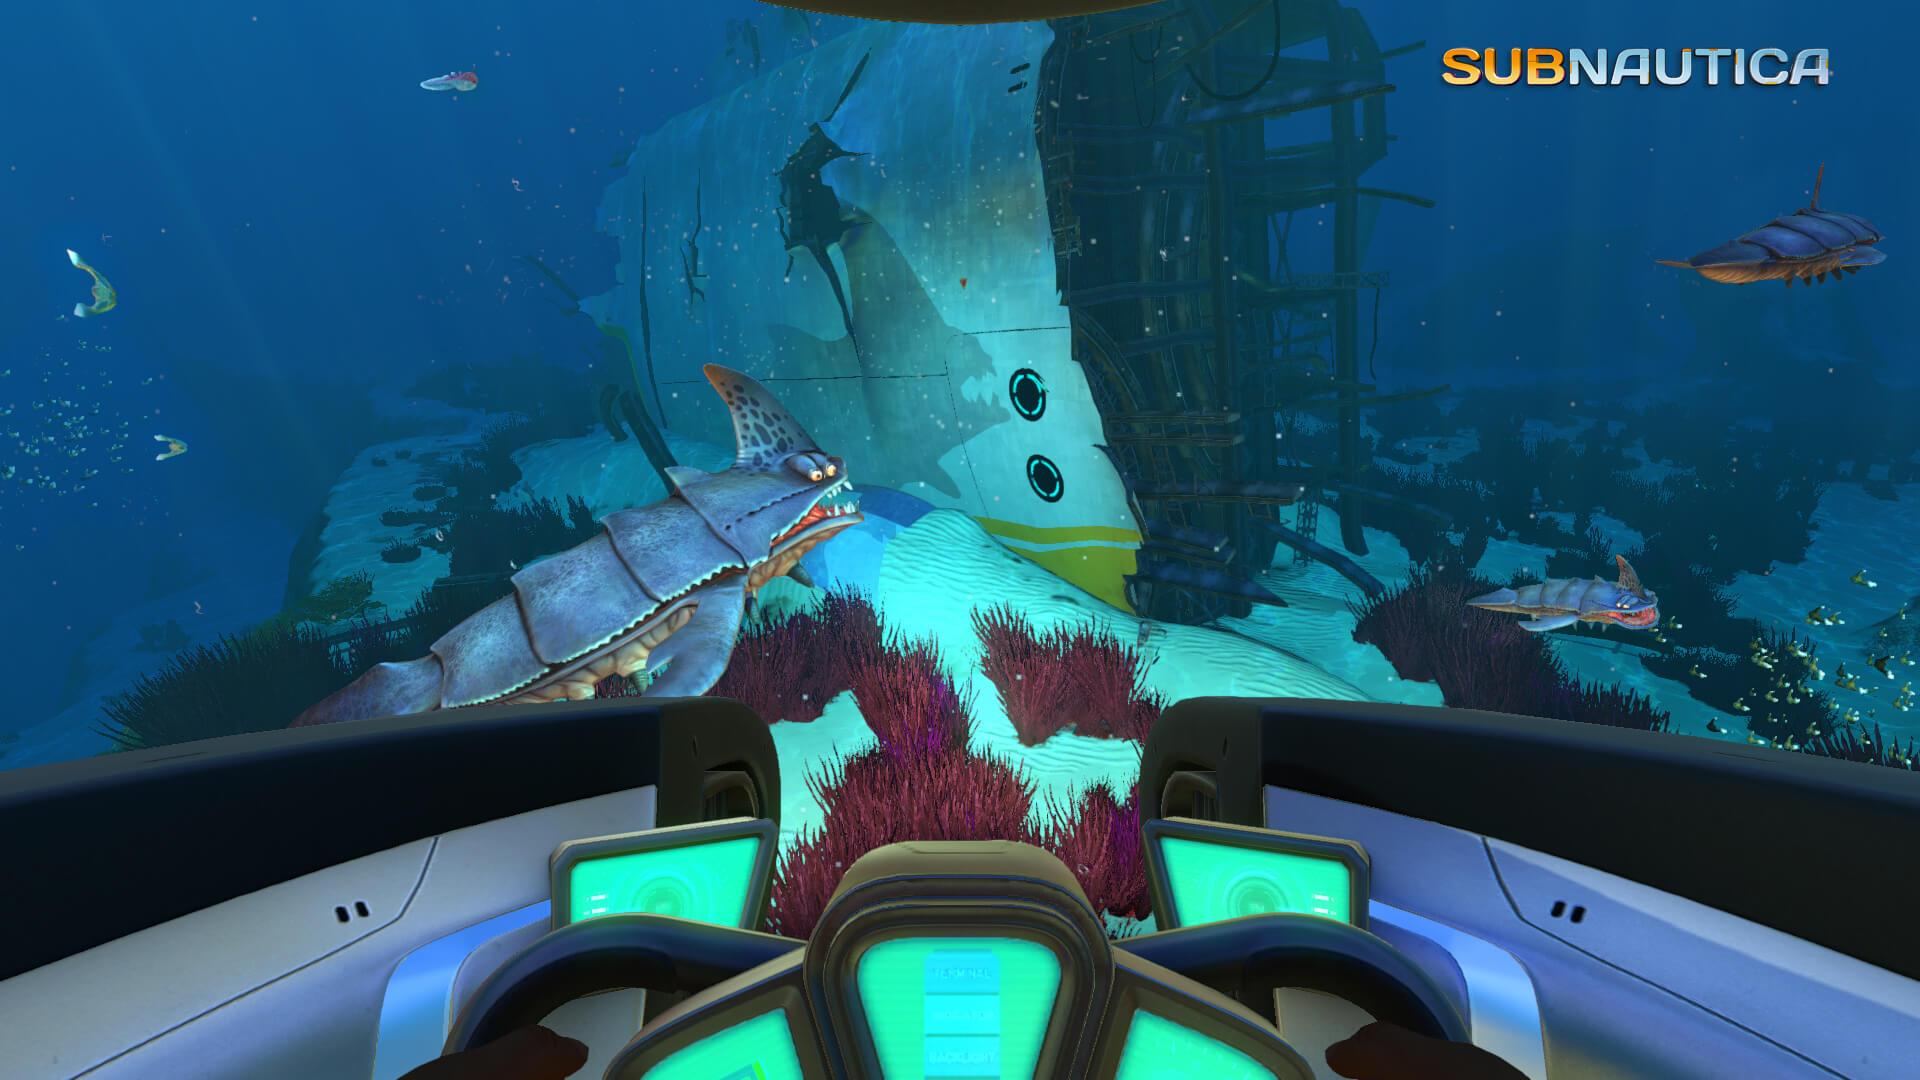 Subnautica oyun inceleme